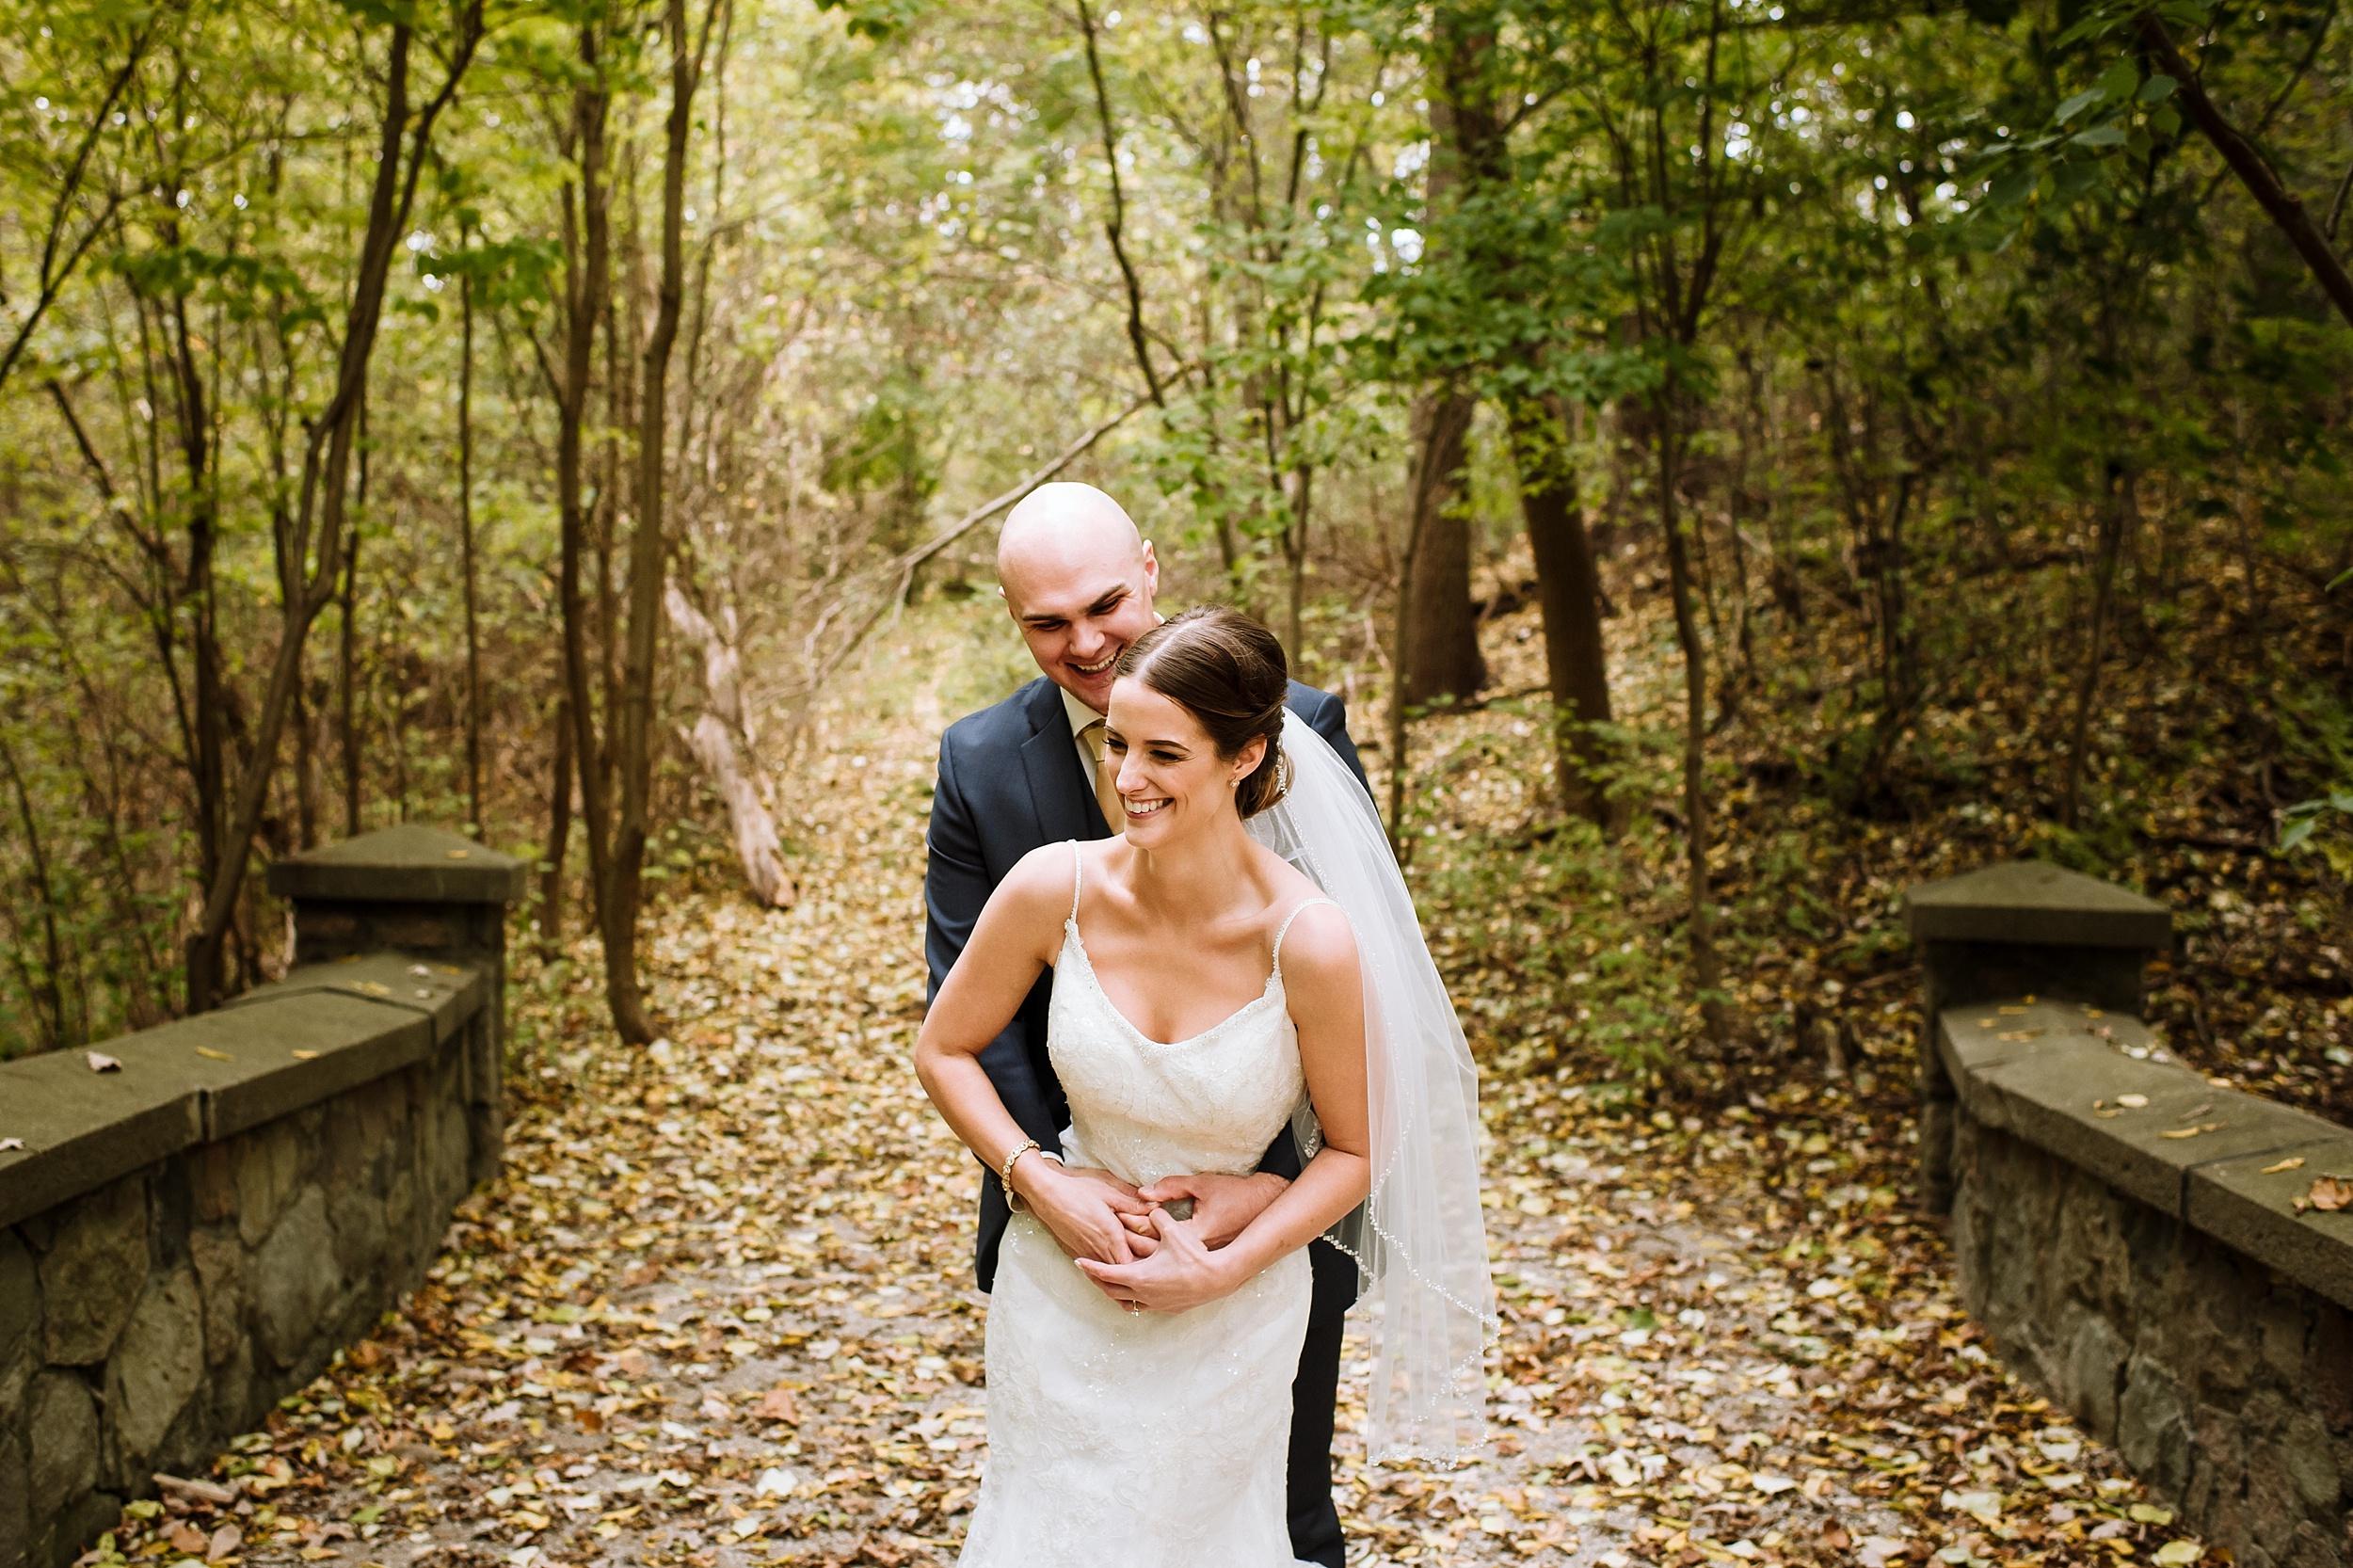 Windemere_Manor_Fall_Wedding_London_Toronto_Wedding_Photographer_0015.jpg